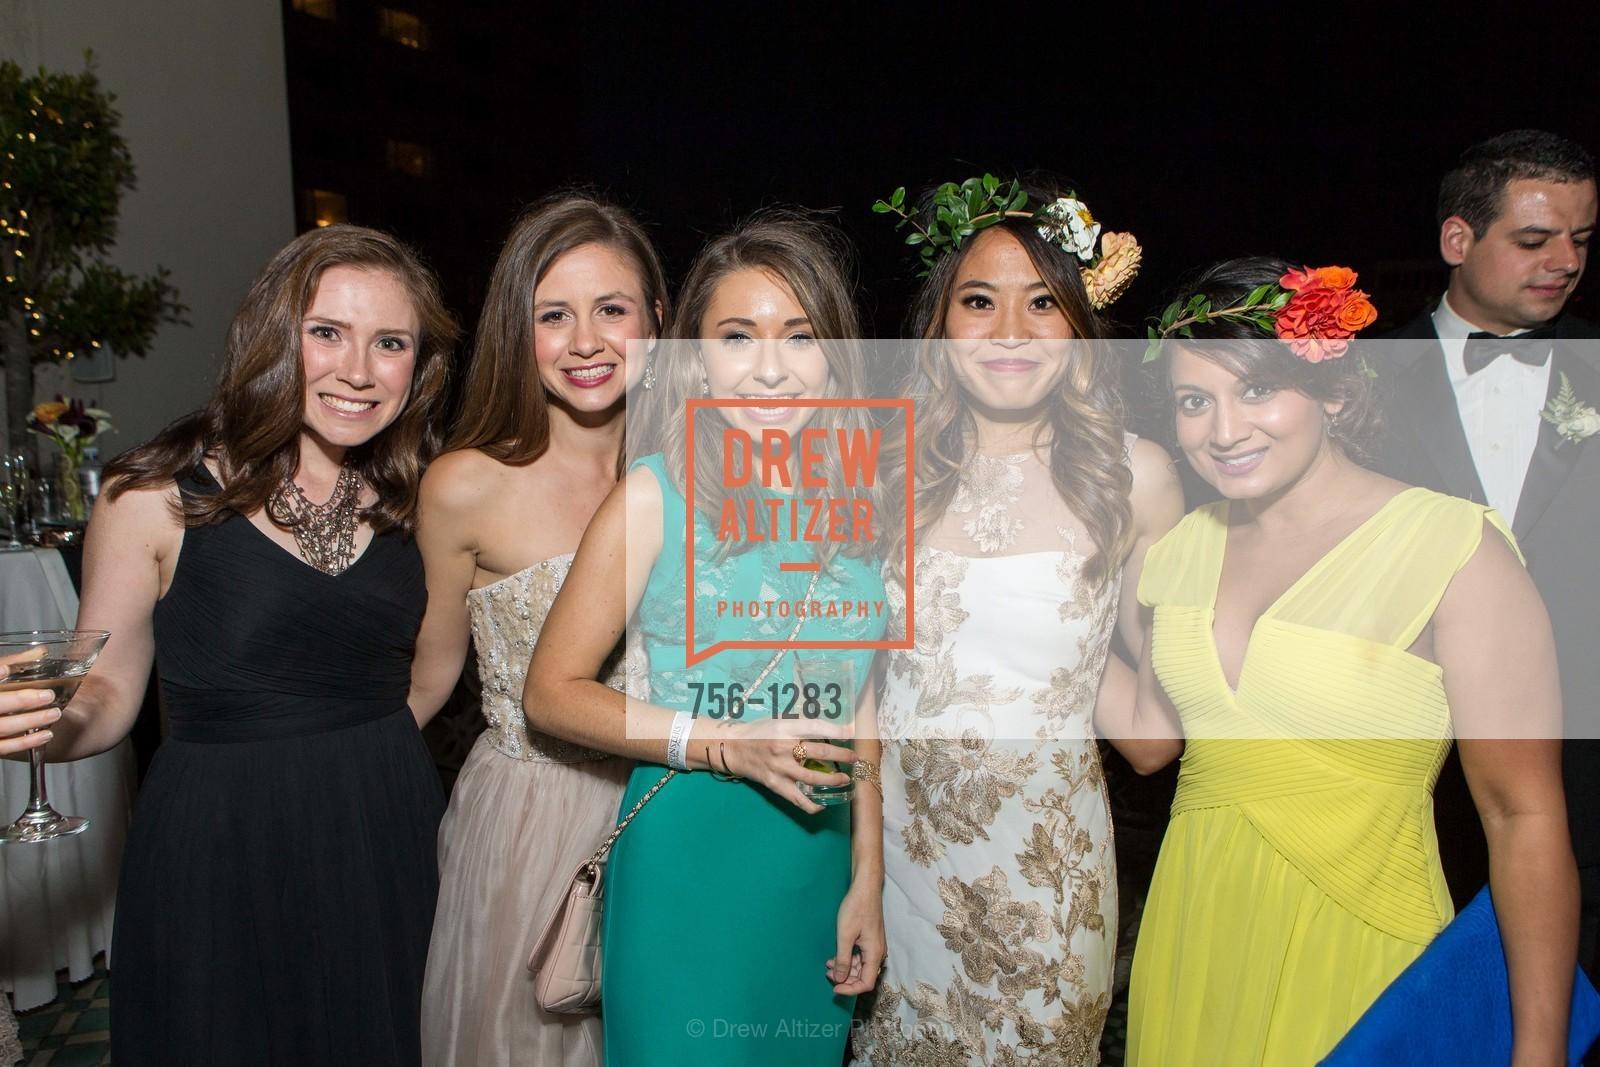 Mara Giarratana Young, Kristi Symon, Olga Levin, Rachel Tsao, Fatima Khan, Photo #756-1283